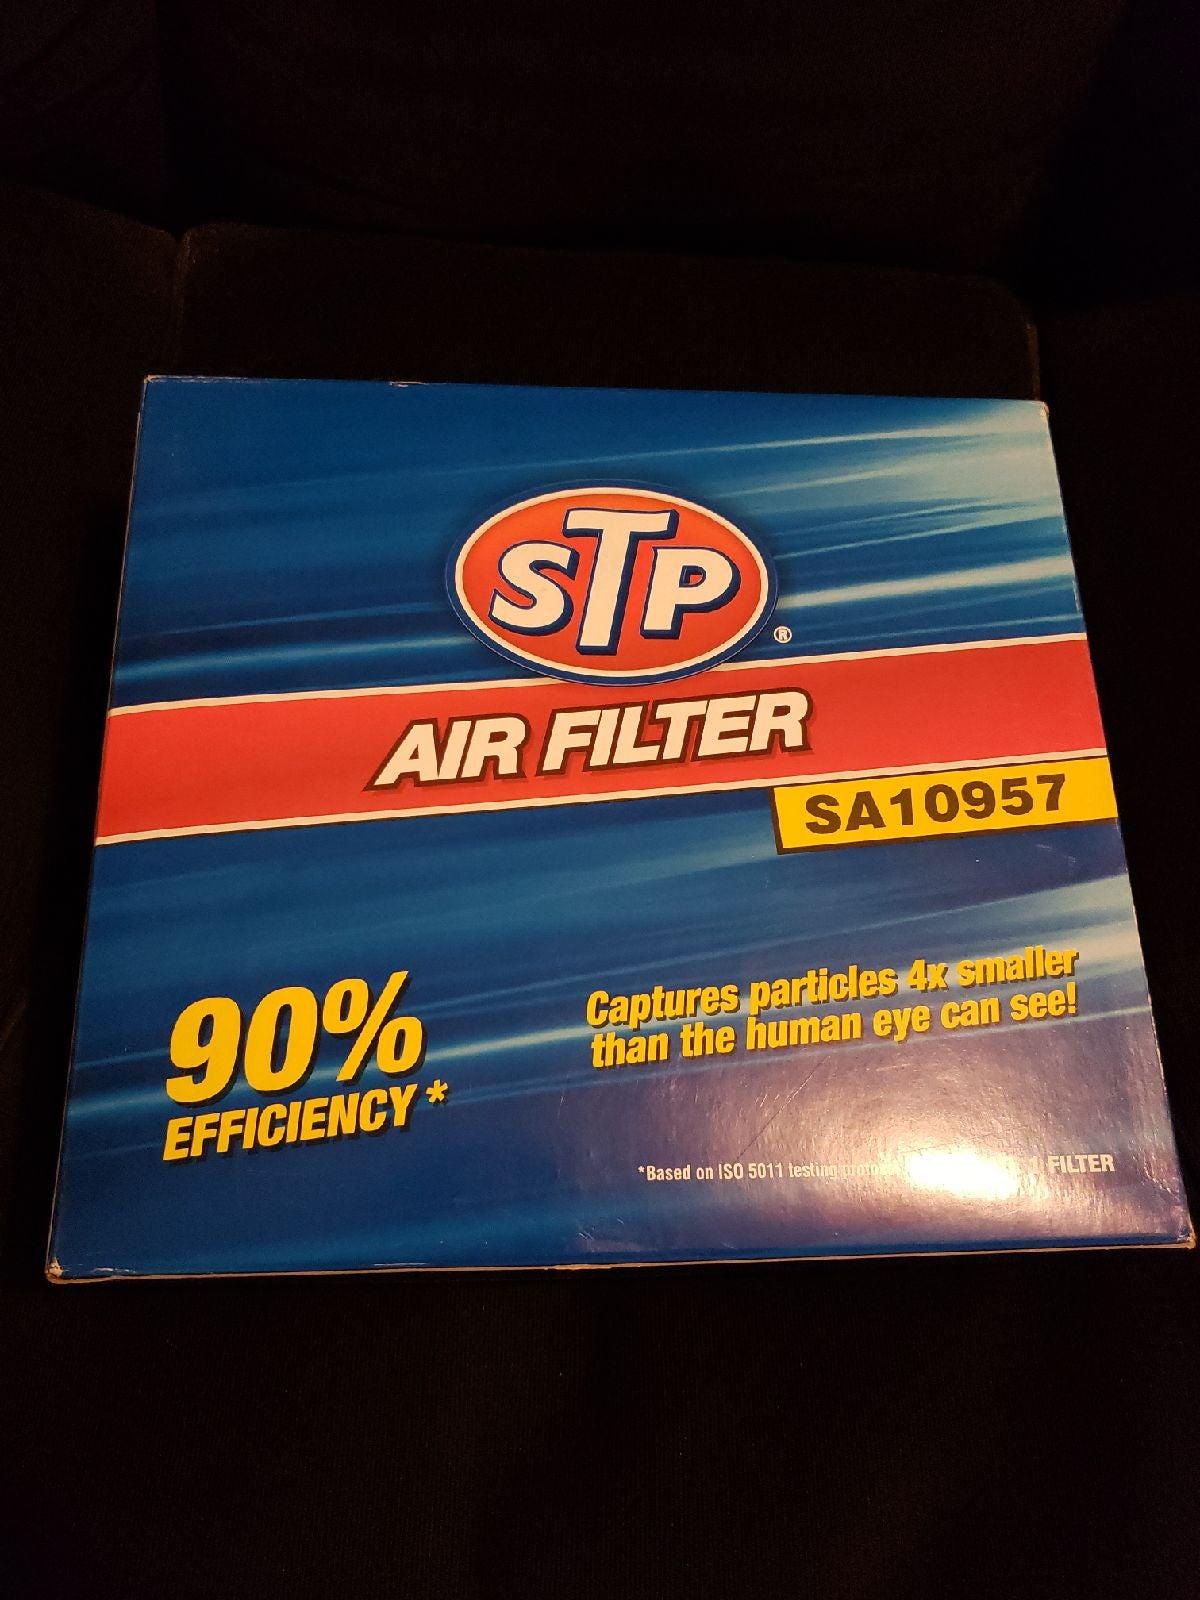 STP Air Filter SA10957 Brand New